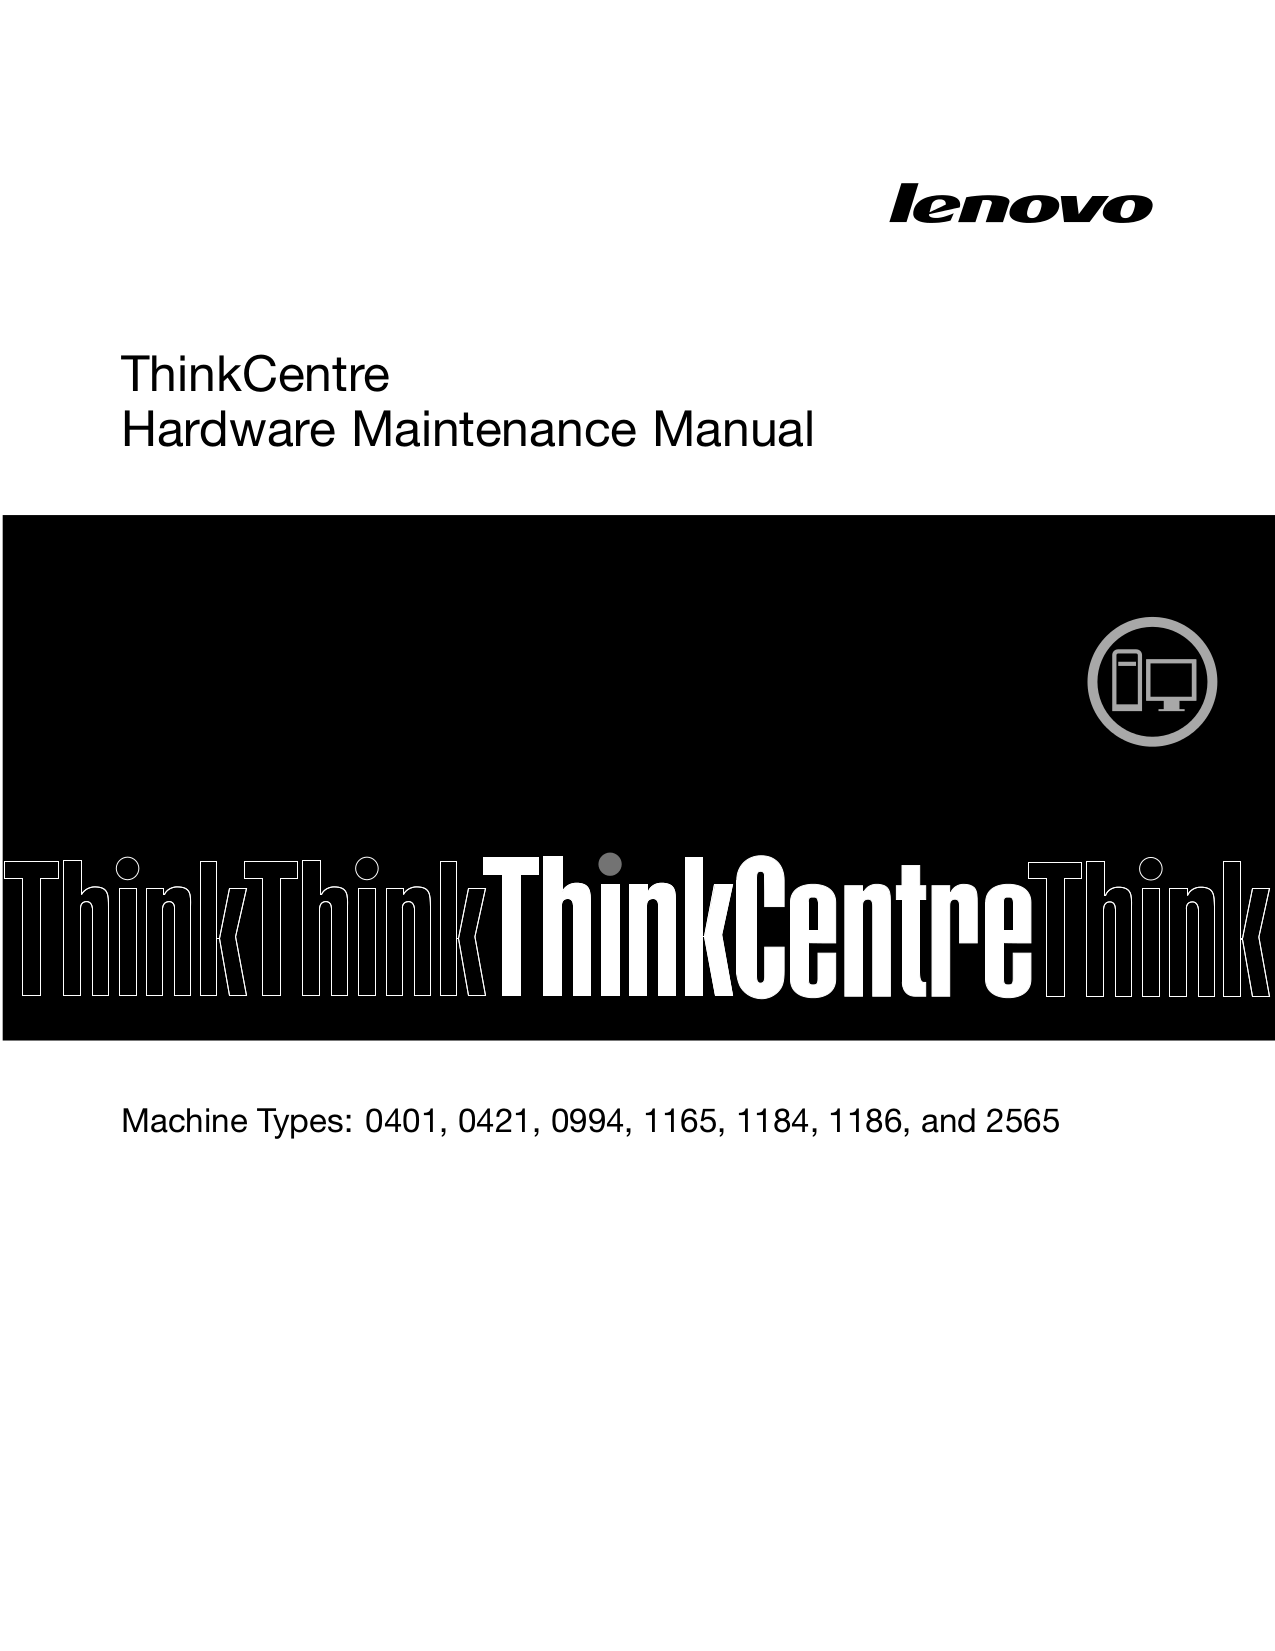 pdf for Lenovo Desktop ThinkCentre A70z 1165 manual